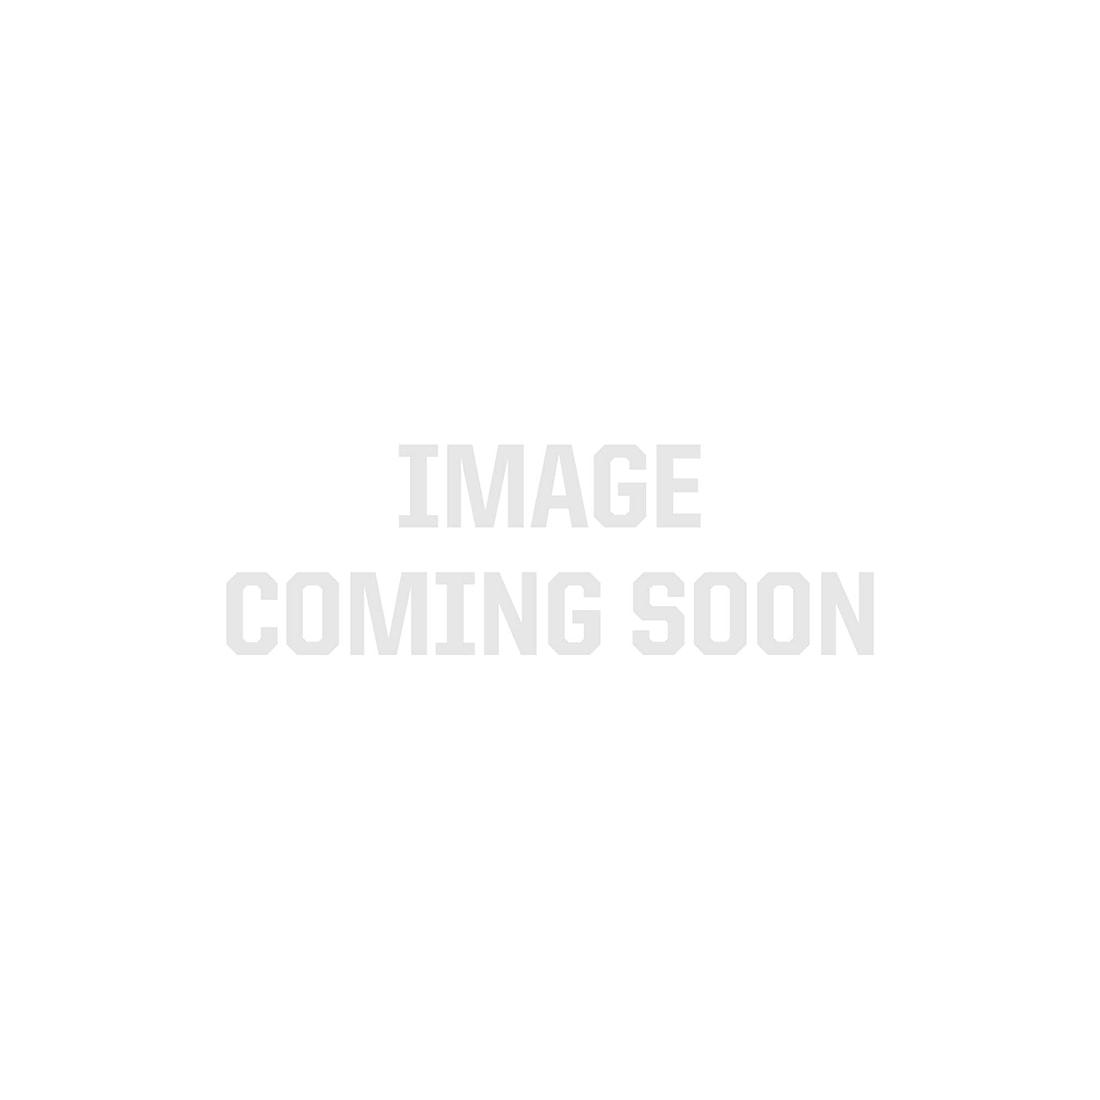 RGBA 4-in-1 5050 CurrentControl LED Strip Light, 72/m, 12mm wide, Sample Kit